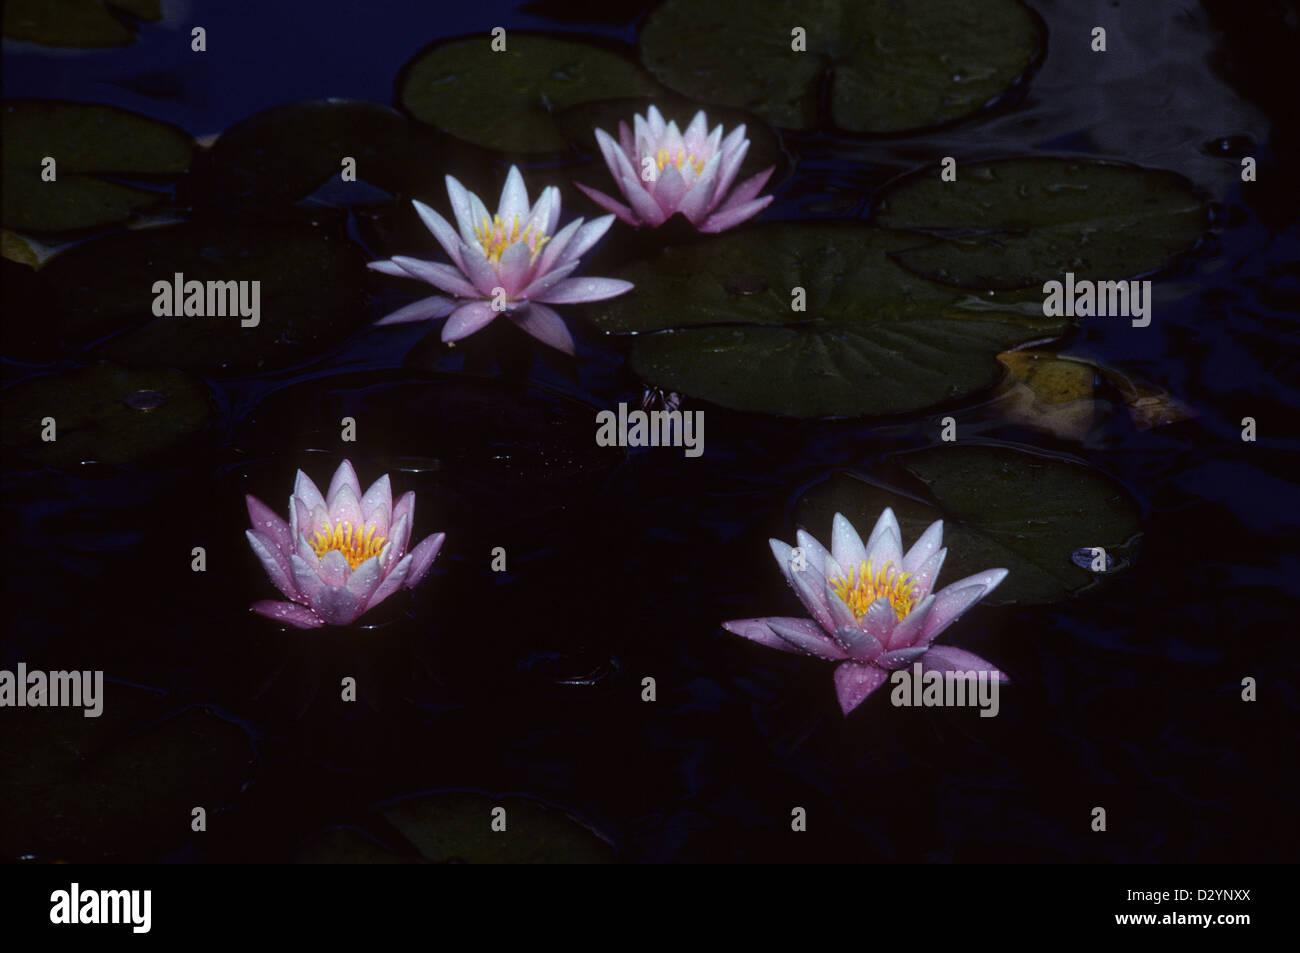 Water lilies woodleigh burlington prince edward island pei canada water lilies woodleigh burlington prince edward island pei canada izmirmasajfo